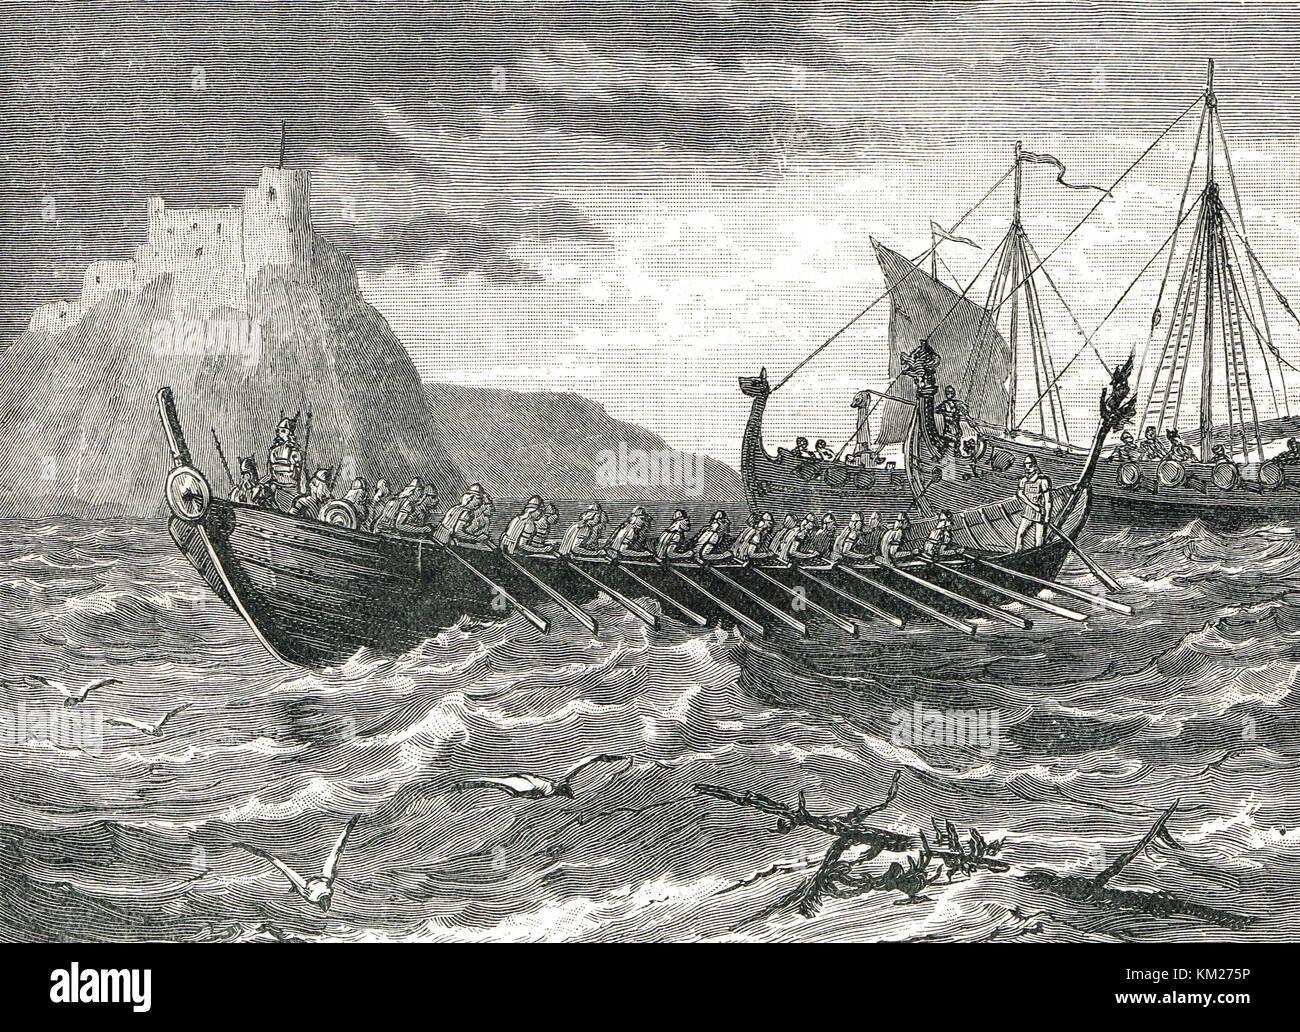 Danish Viking ships of the 9th century - Stock Image